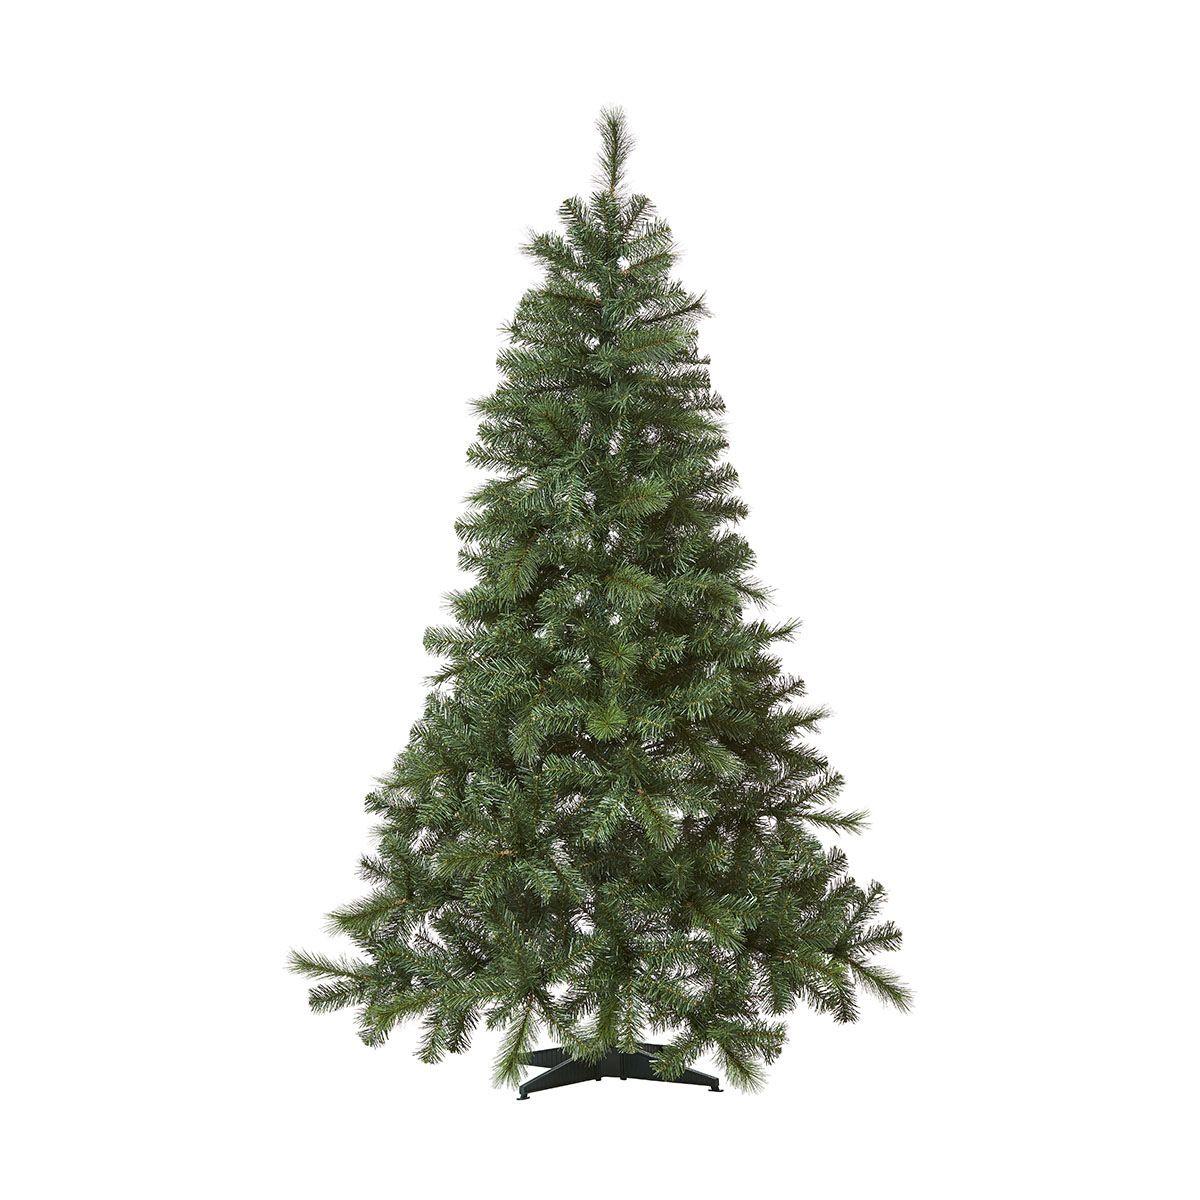 Christmas Tree Kmart Nz